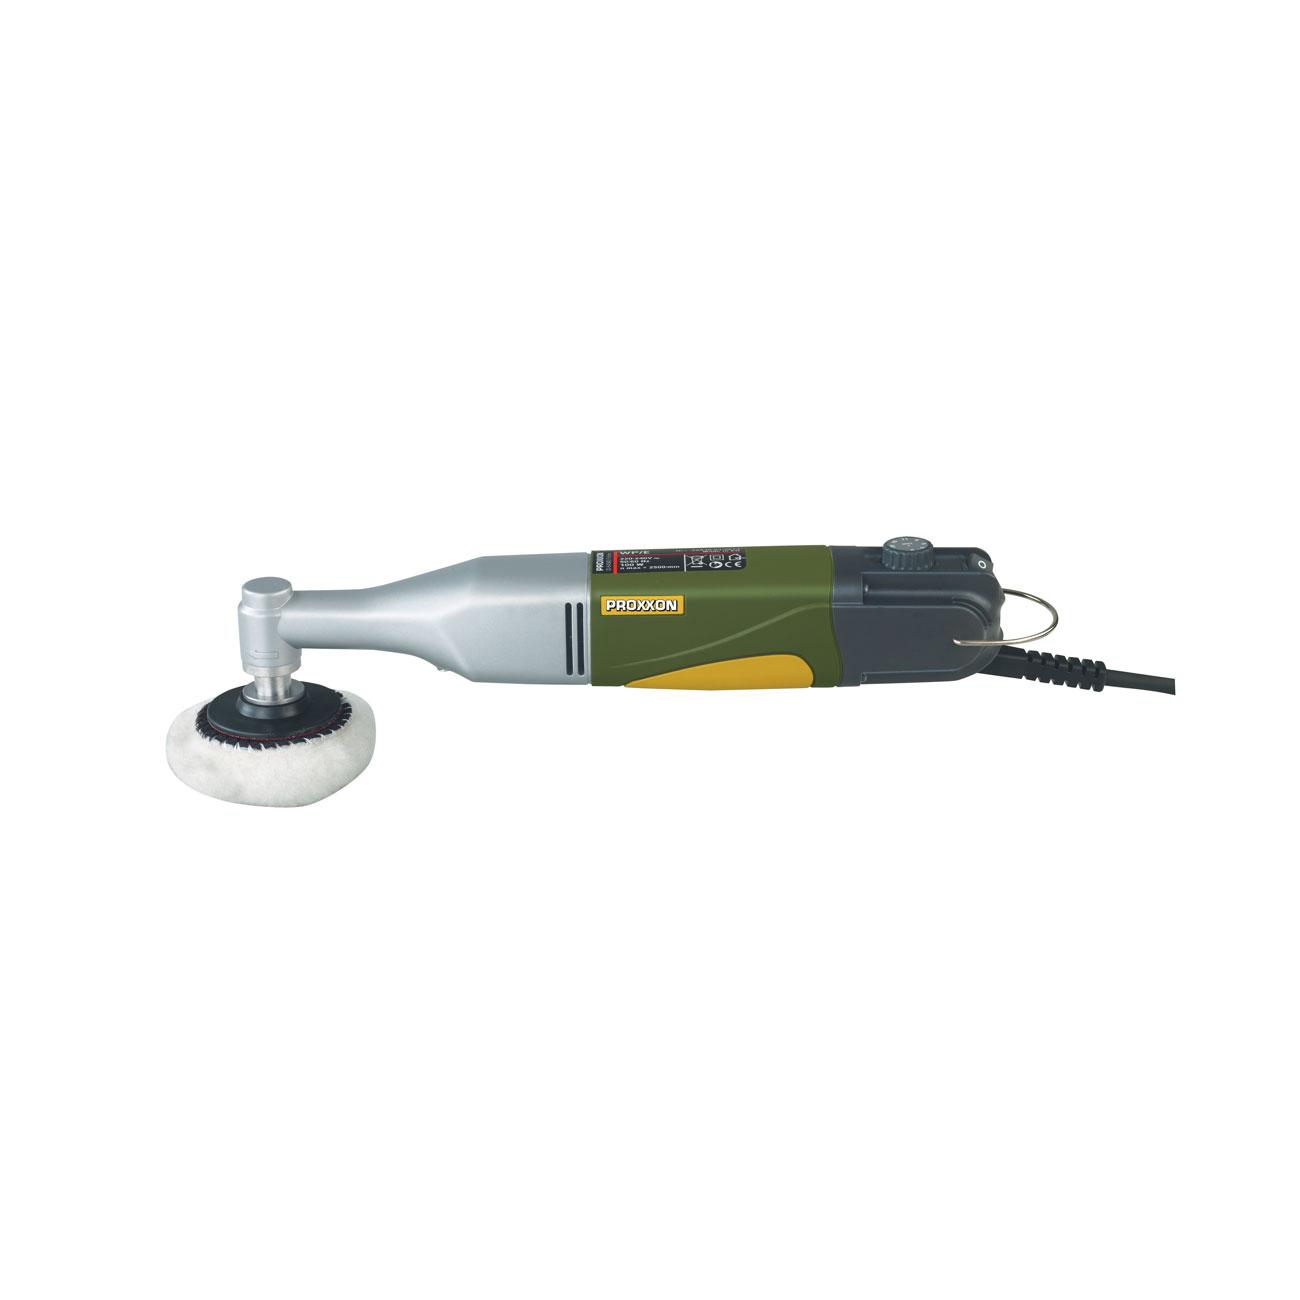 Proxxon WP / E polisseuse d'angle art. 28660